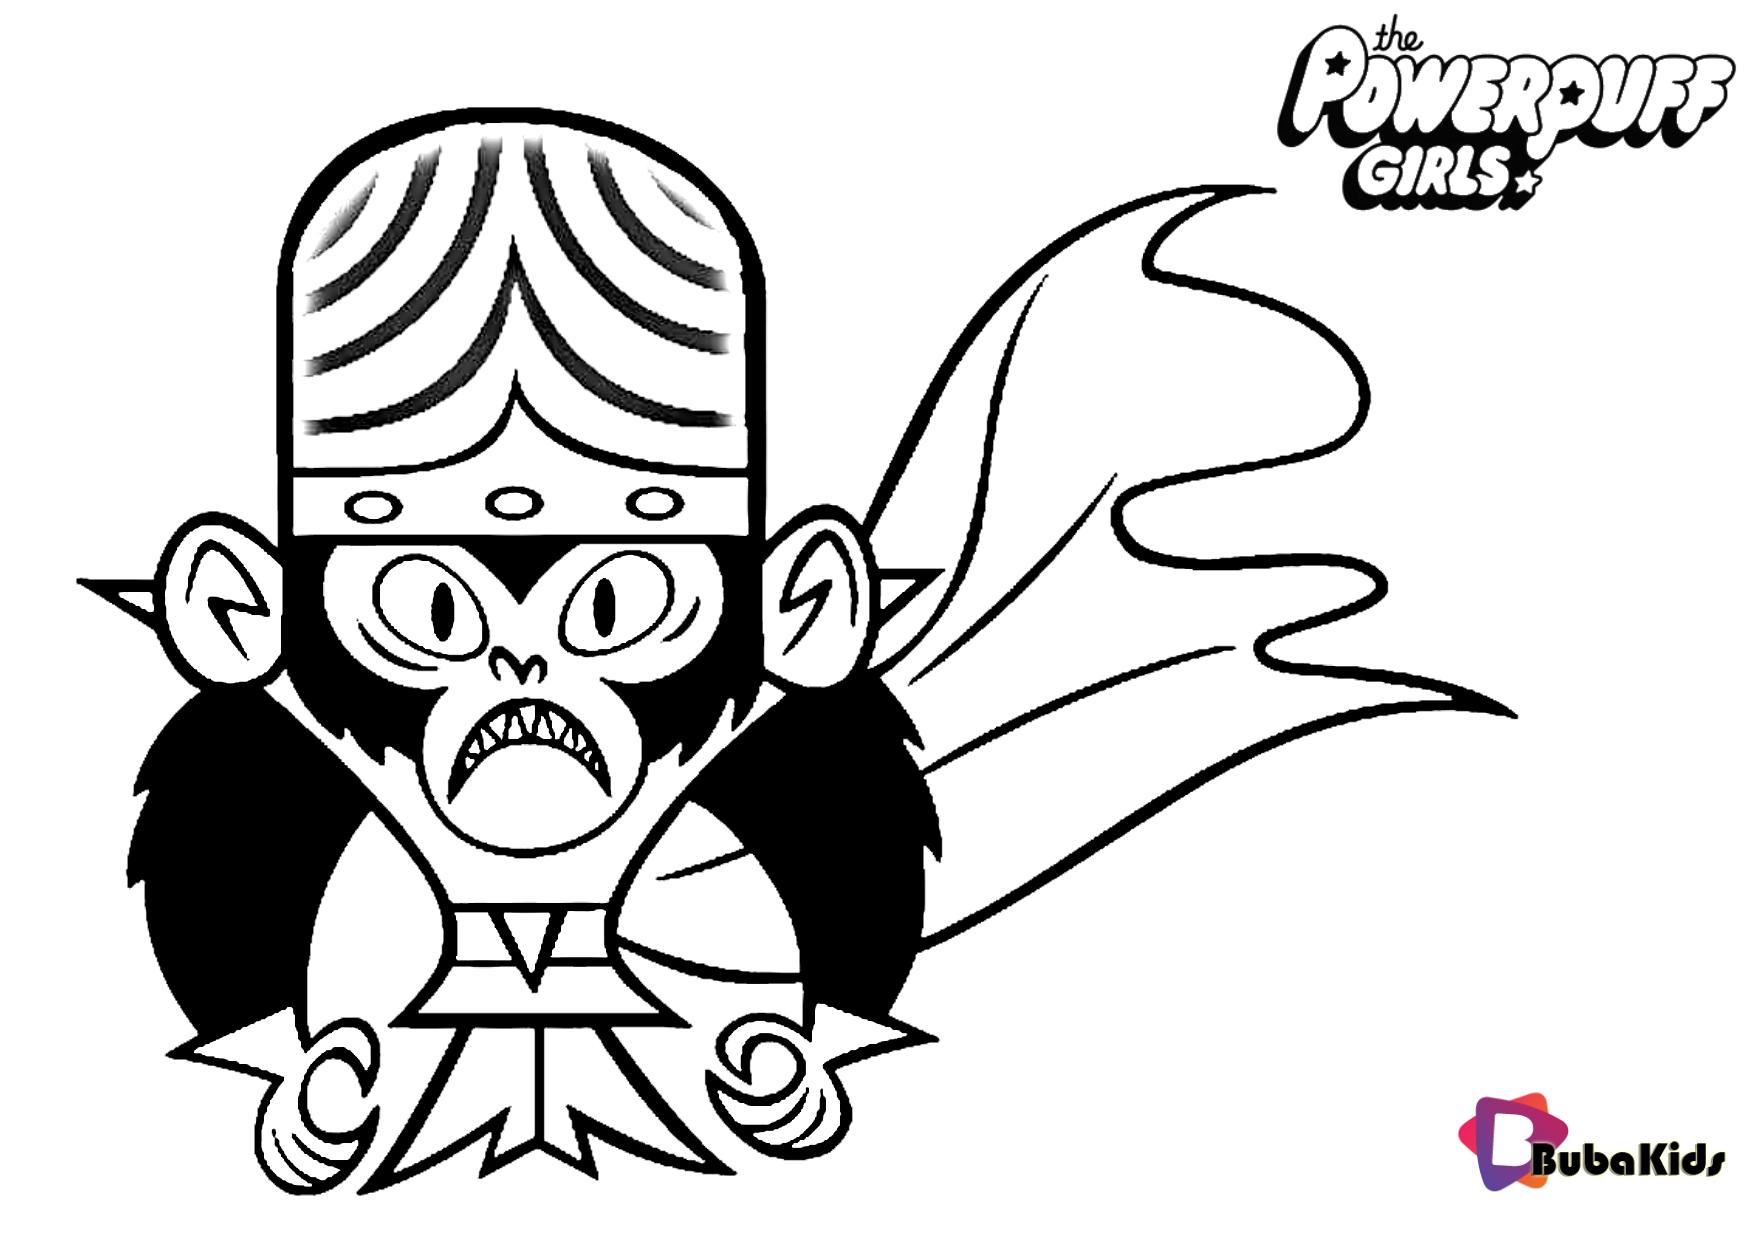 An evil genius monkey Mojo Jojo in naimated series The Powerpuff Girls Wallpaper